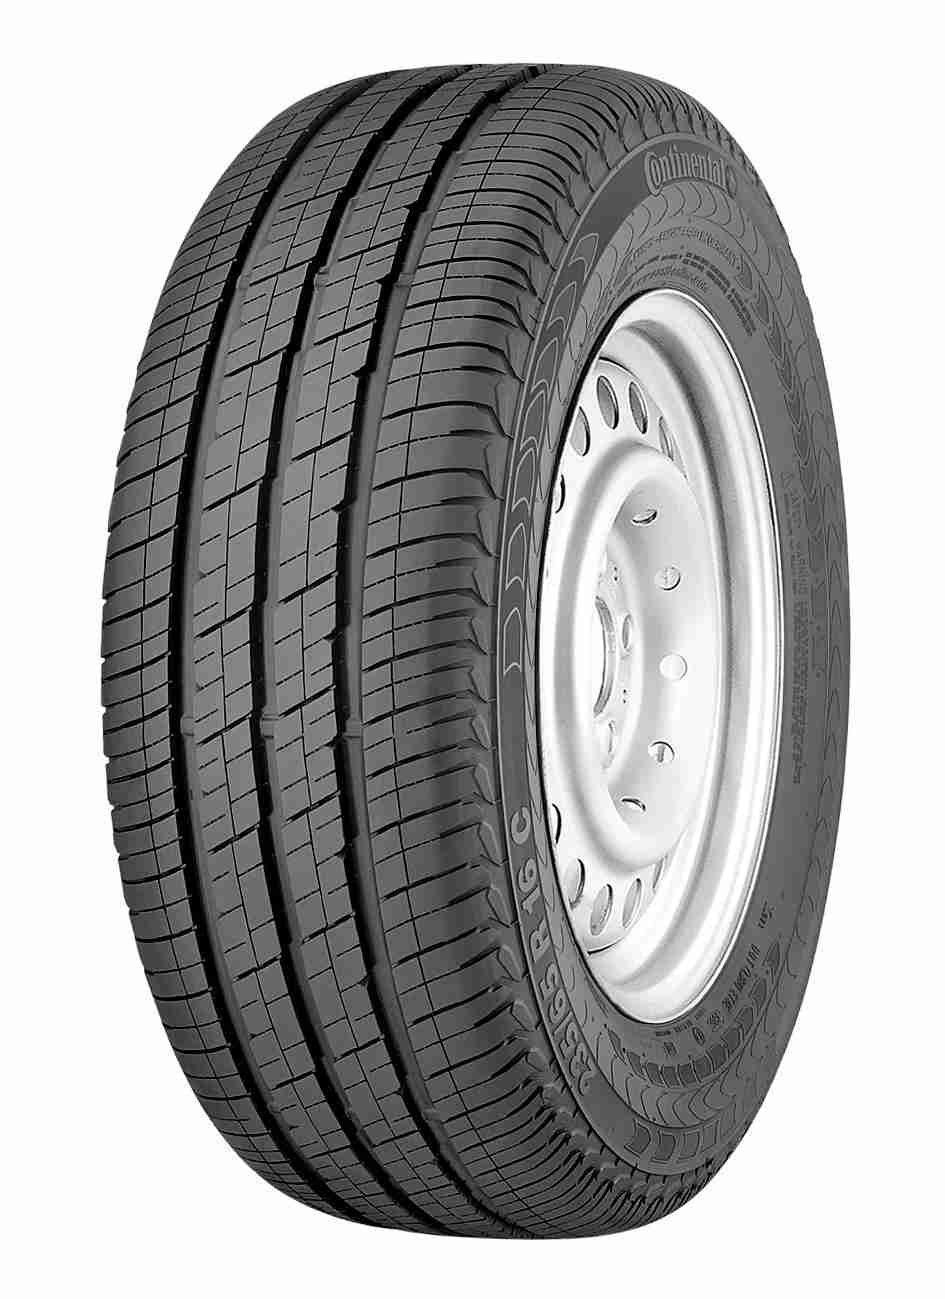 Neumático CONTINENTAL VANCO-2 235/65R16 121 R